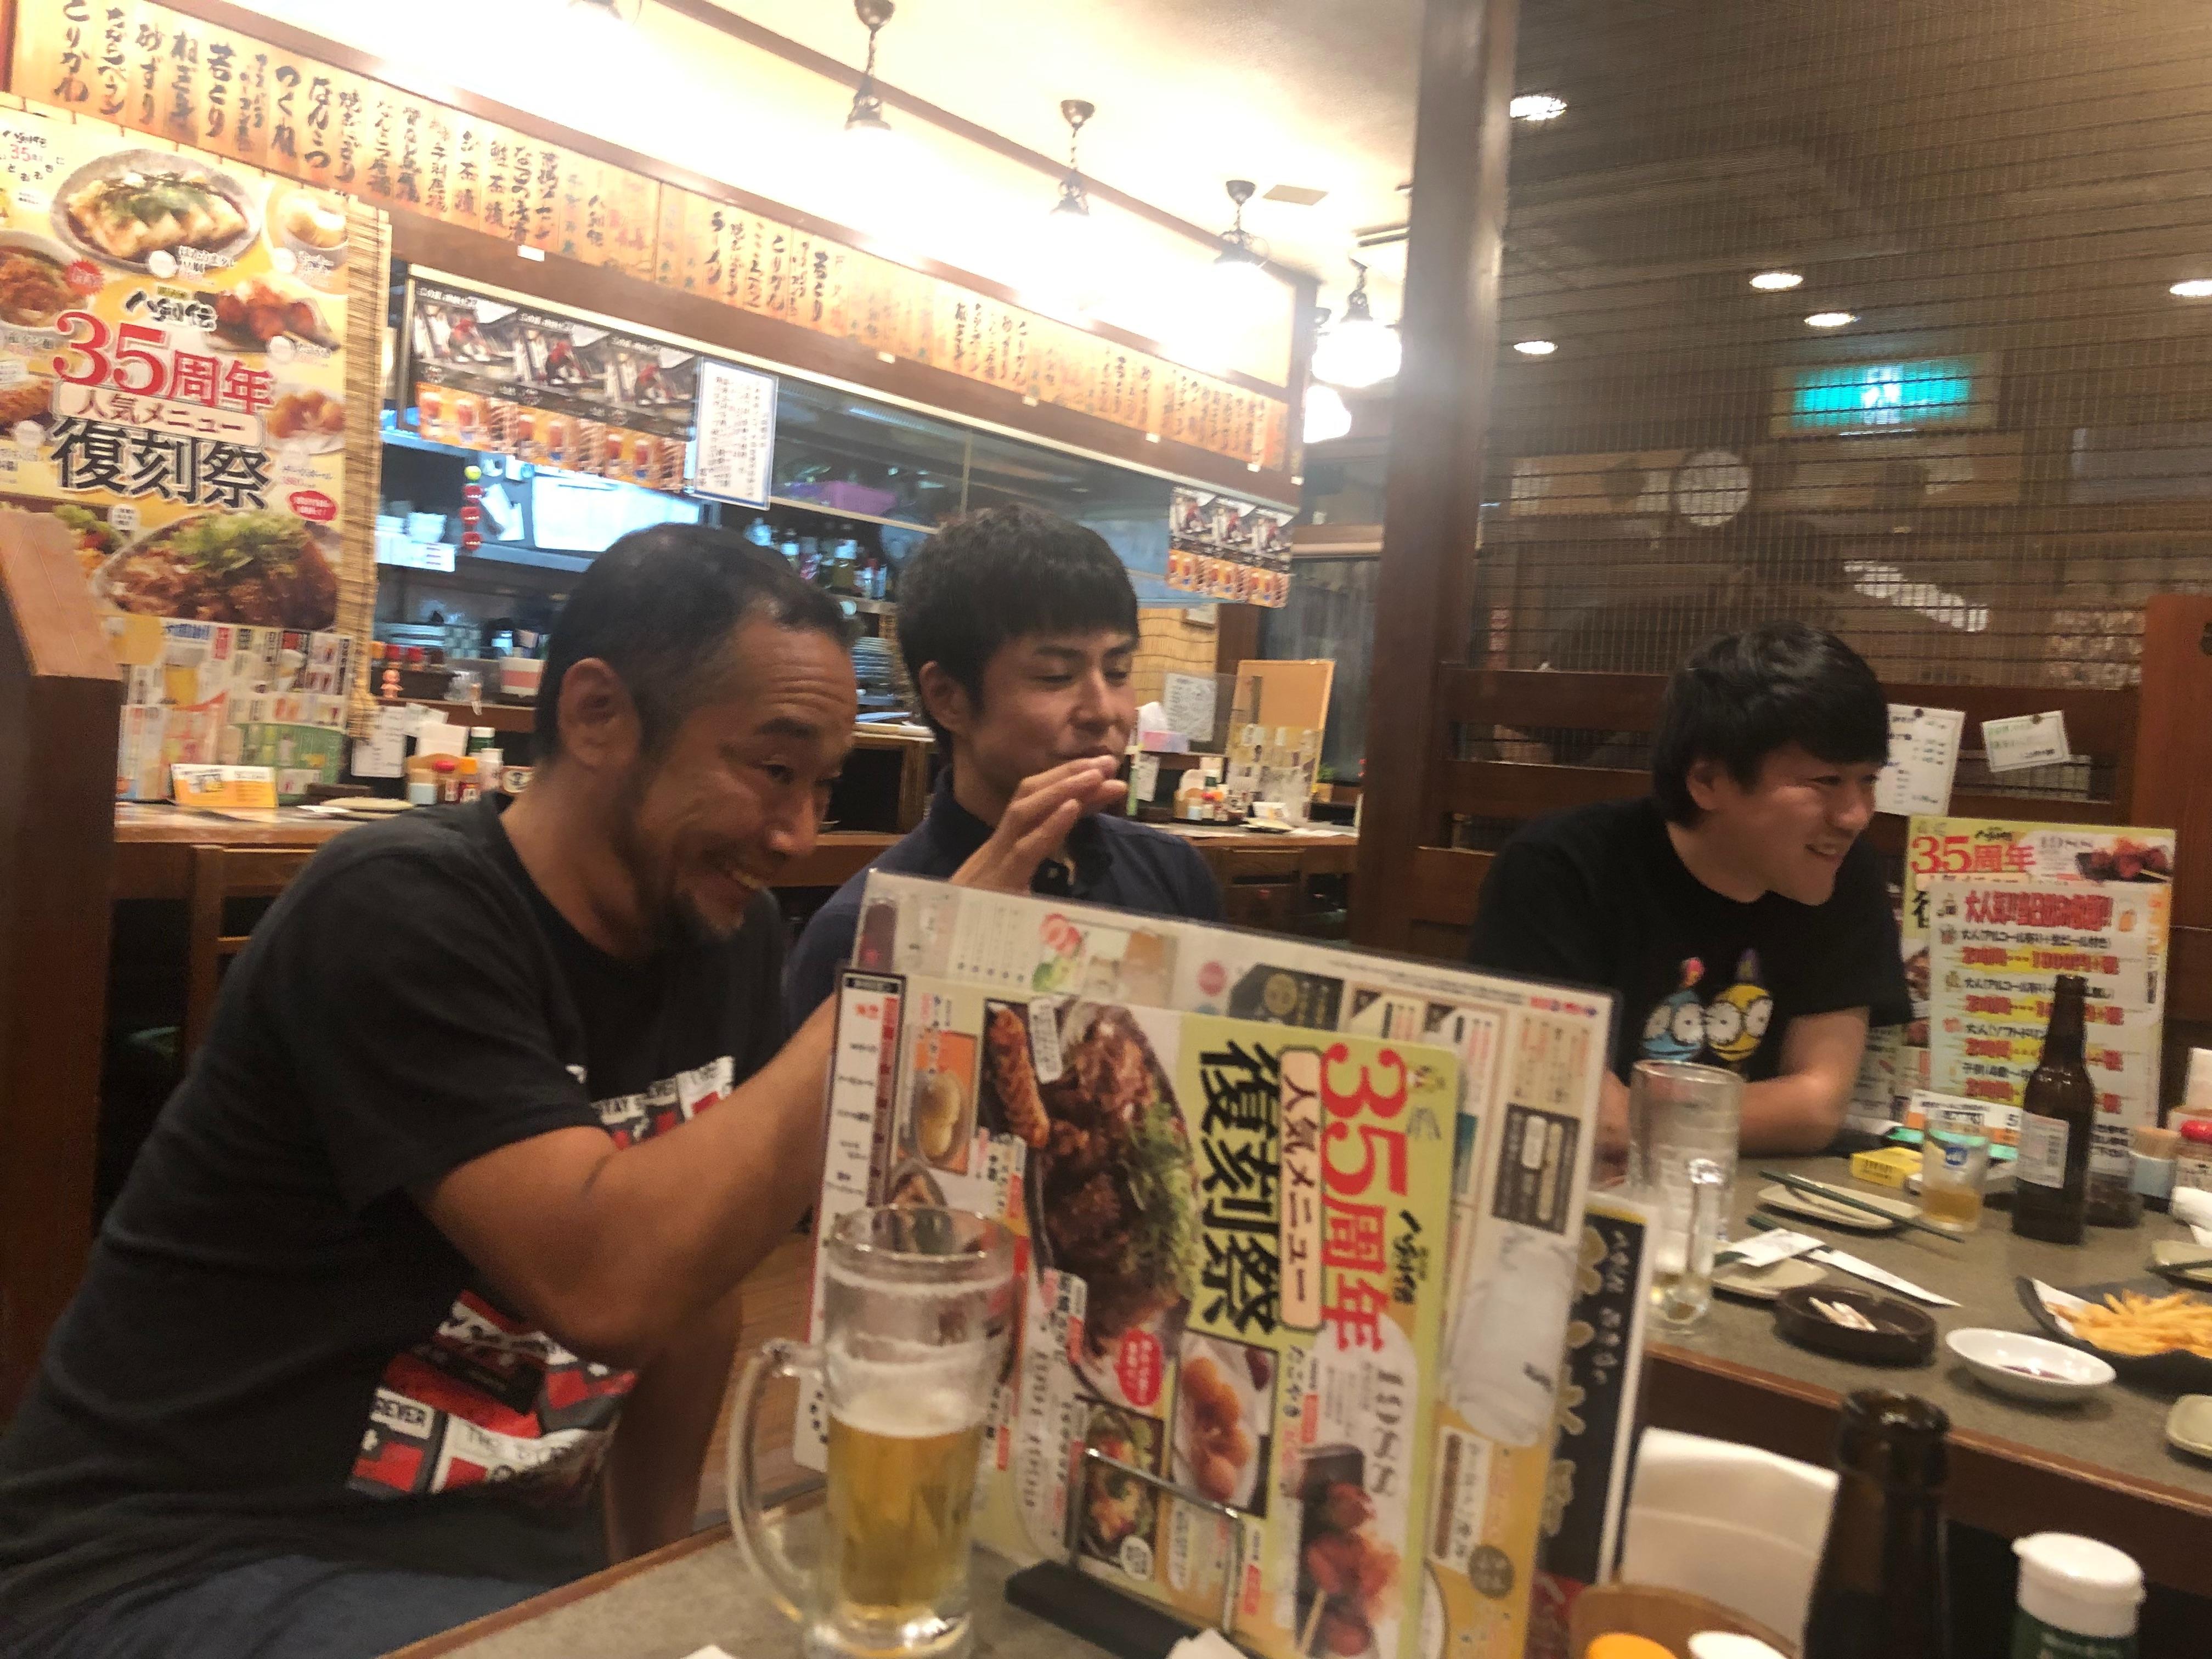 f:id:masanori-kato1972:20190719185022j:image